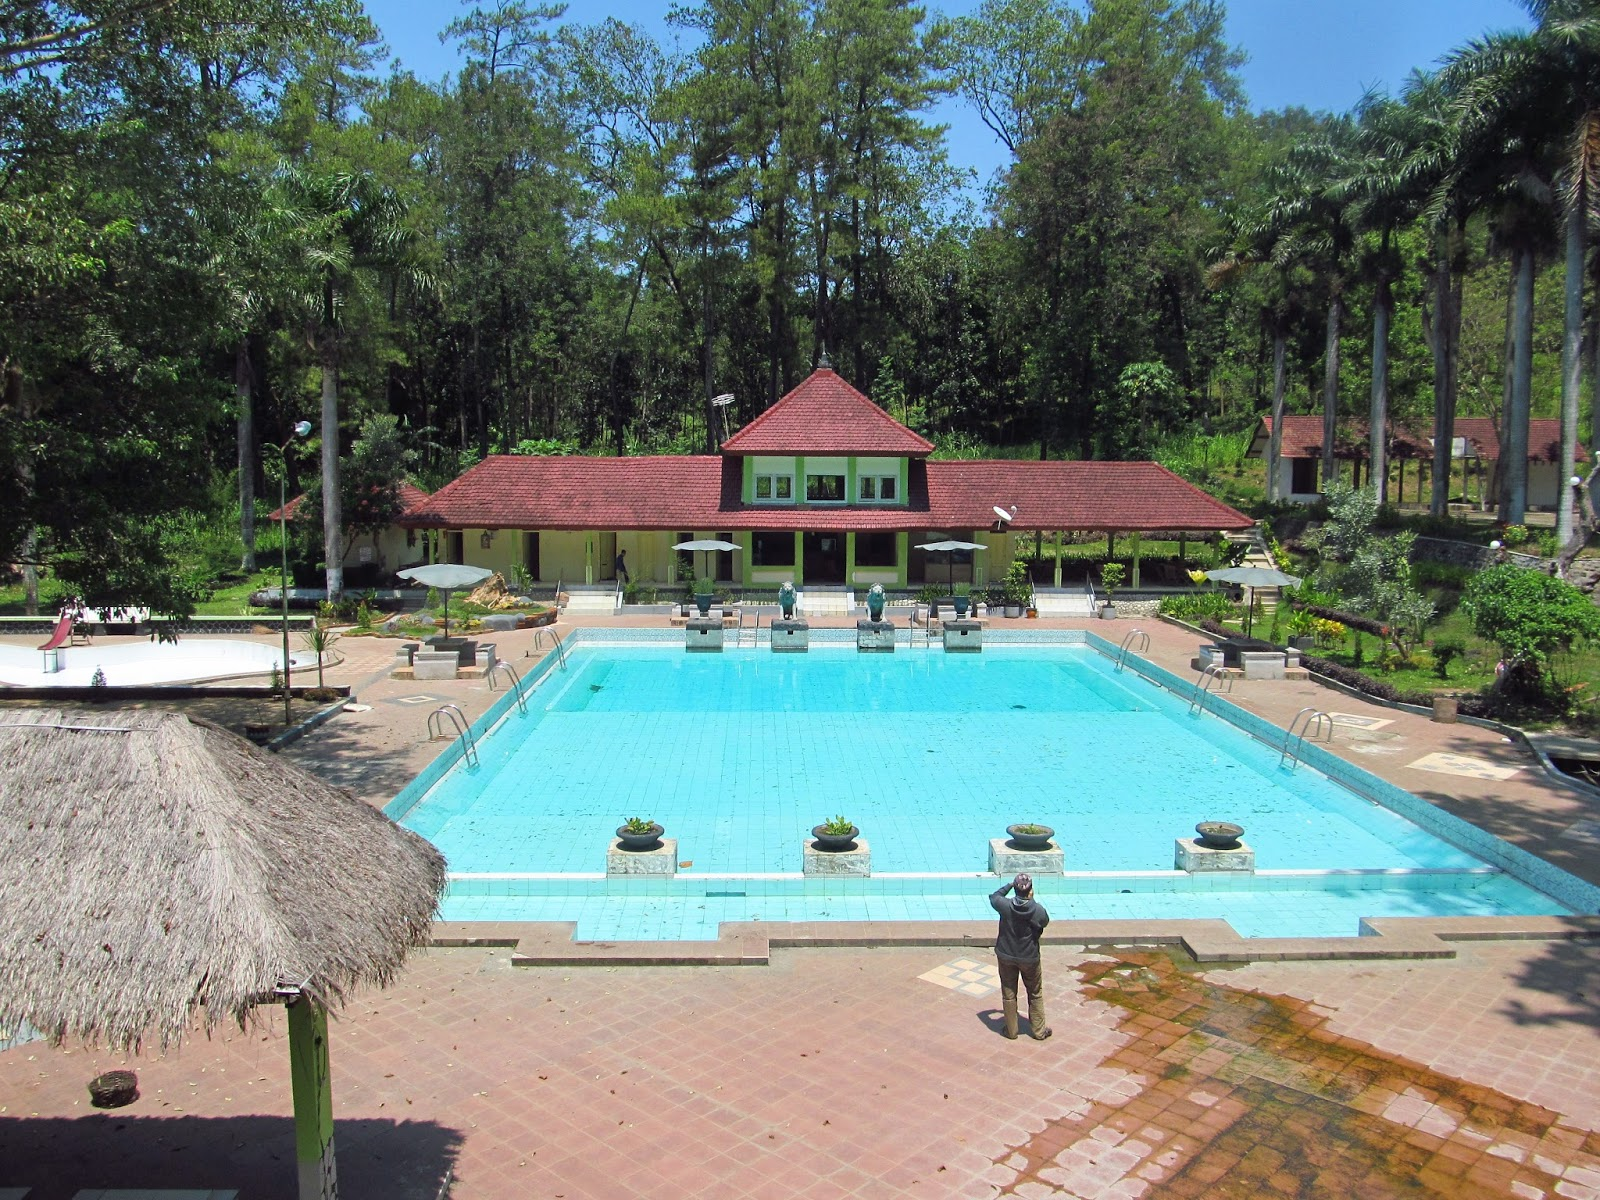 IMG 1741 - Tempat Wisata yang Terkenal Angker di Bondowoso, Buat Merinding!